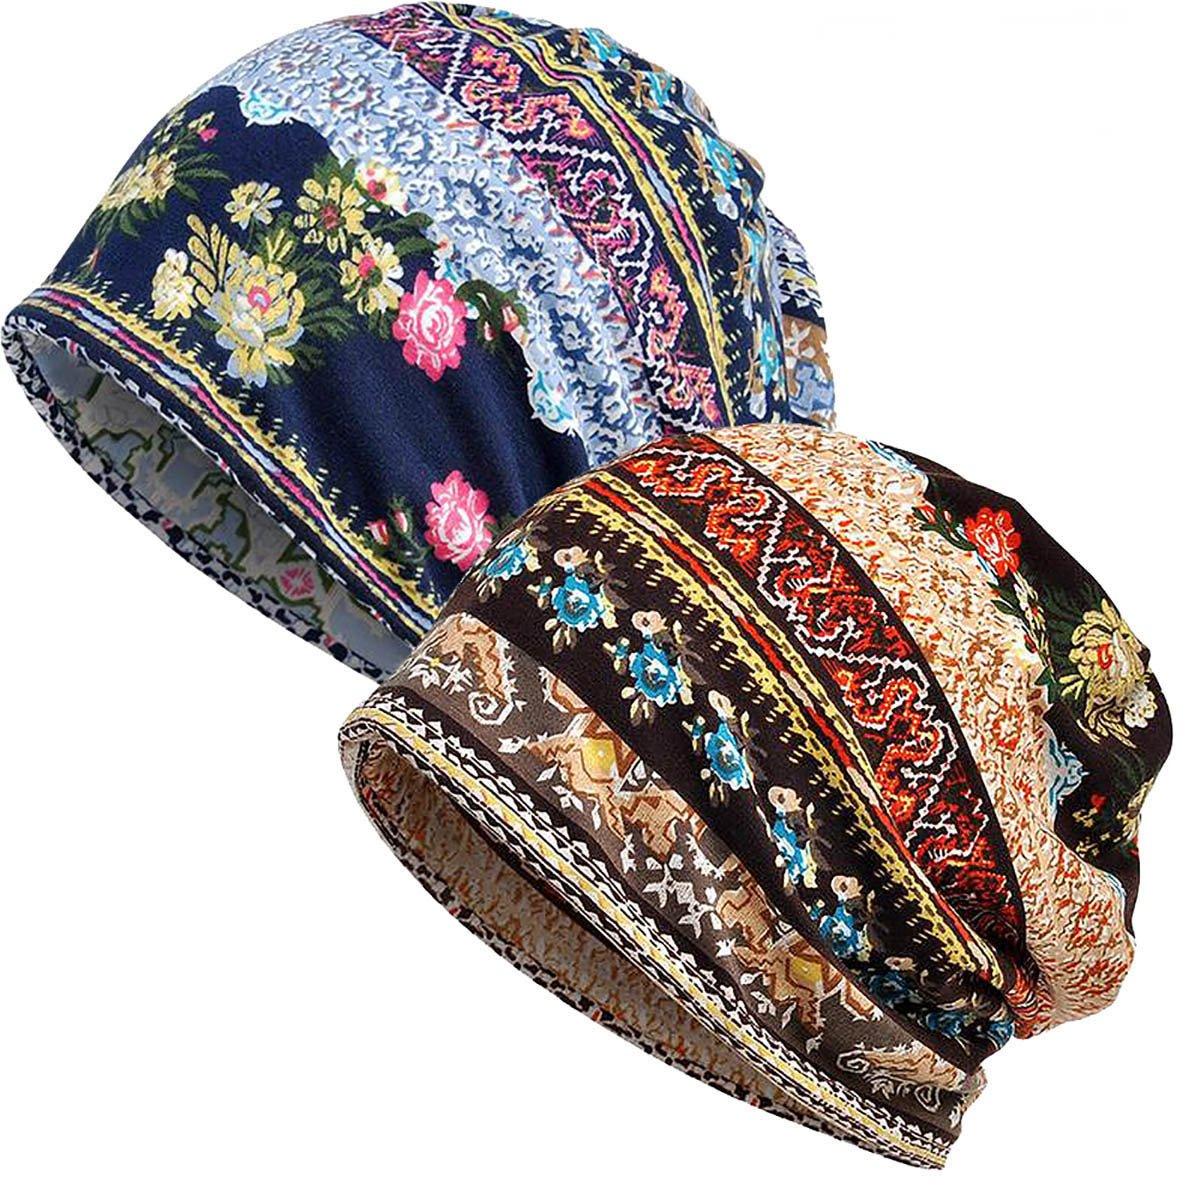 WELROG Women Turban Headwear Chemo Hat - 100% Cotton Elastic Thin Cancer Cap for Women Retro Beanies Bucket